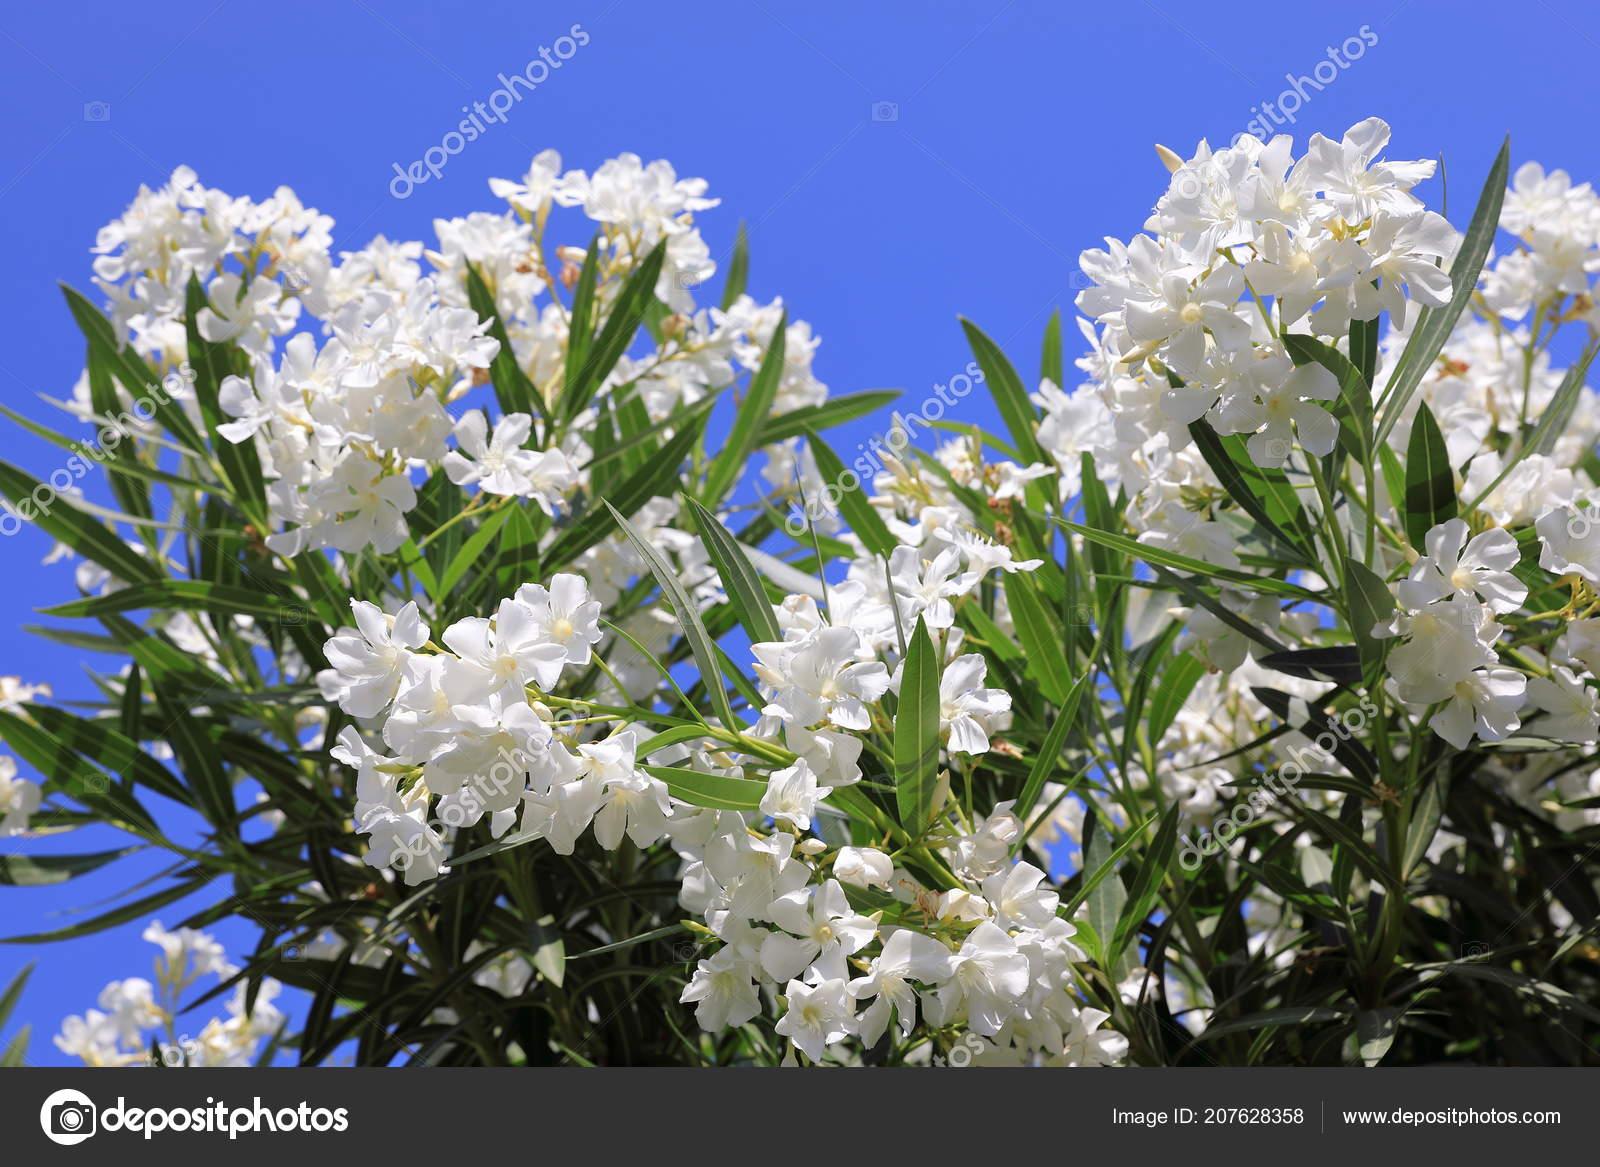 Nerium Oleander White Oleander Flowers Blue Sky Background Stock